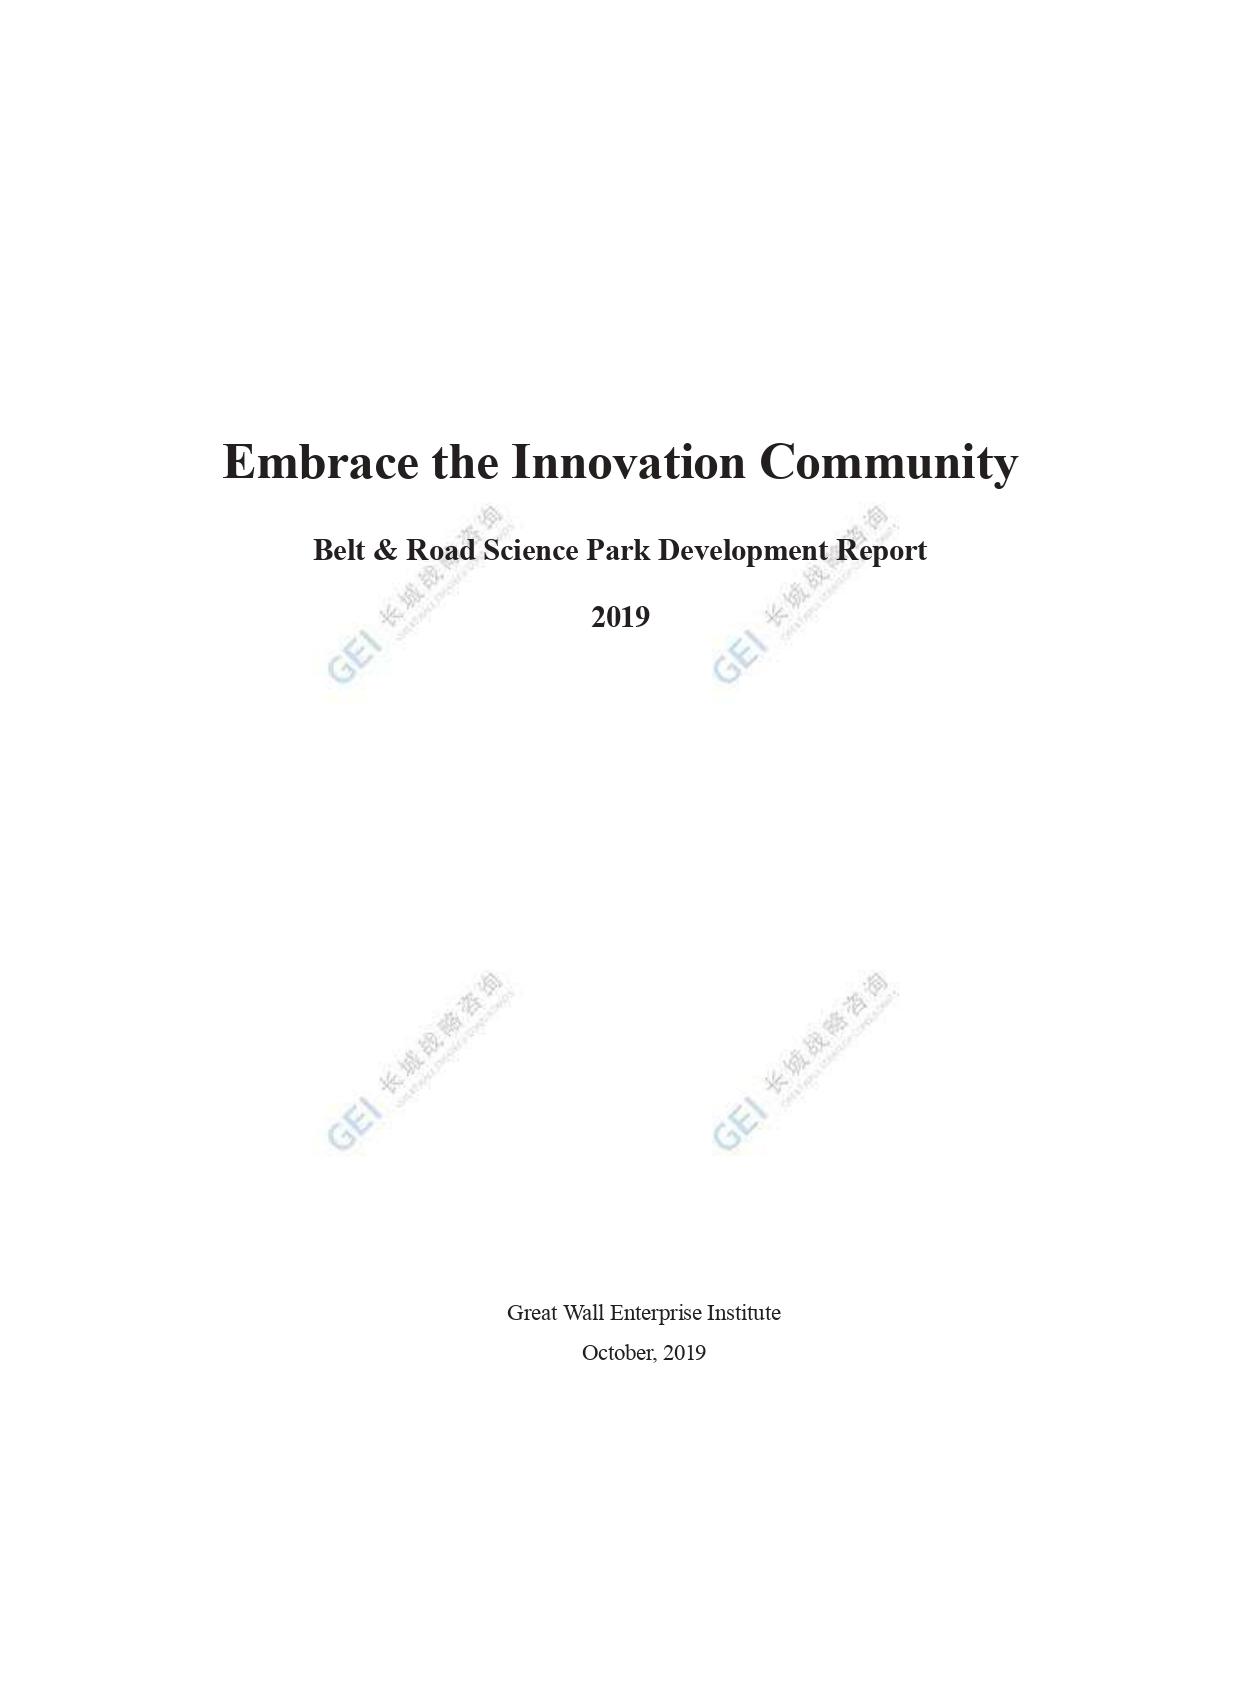 GEI-B&R Science Park Development Report 2019_page-0002.jpg